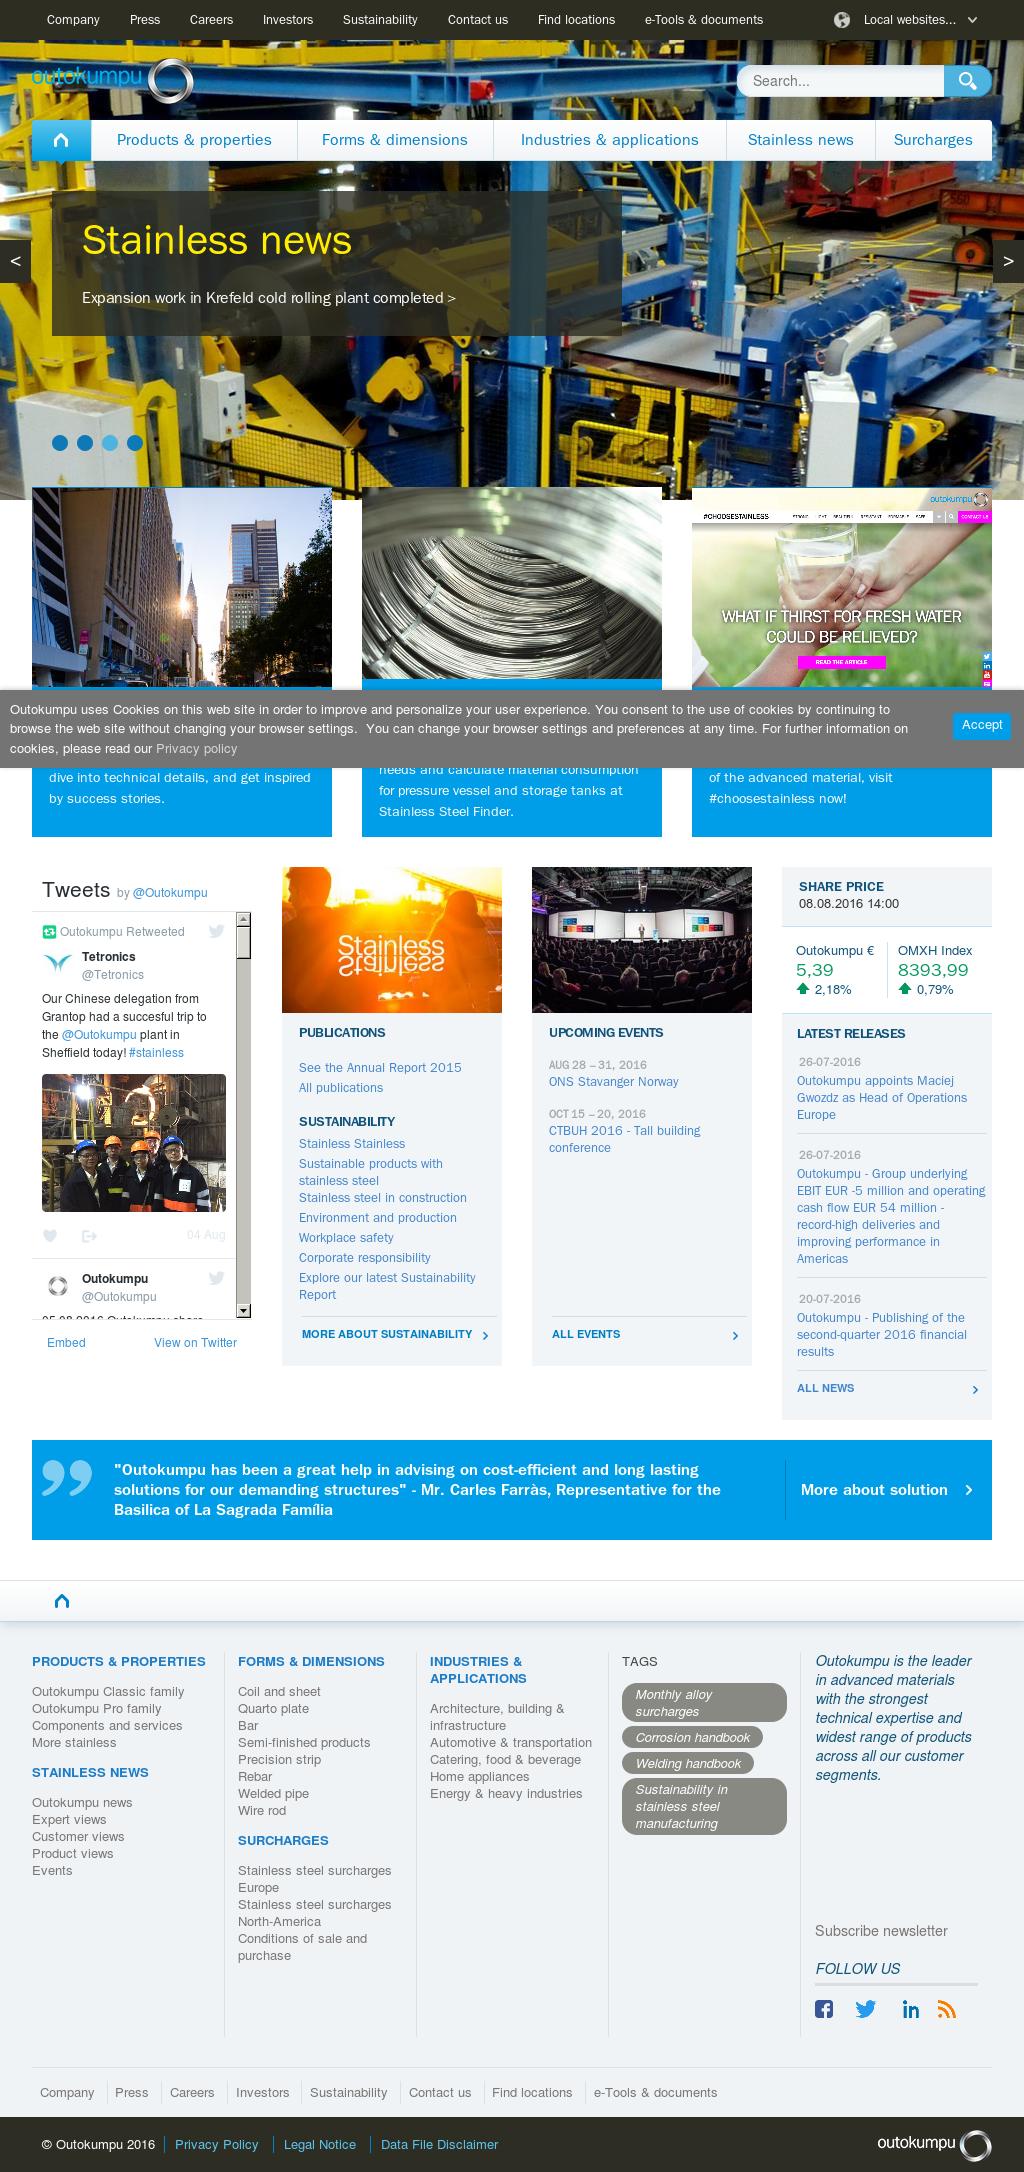 Outokumpu Competitors, Revenue and Employees - Owler Company